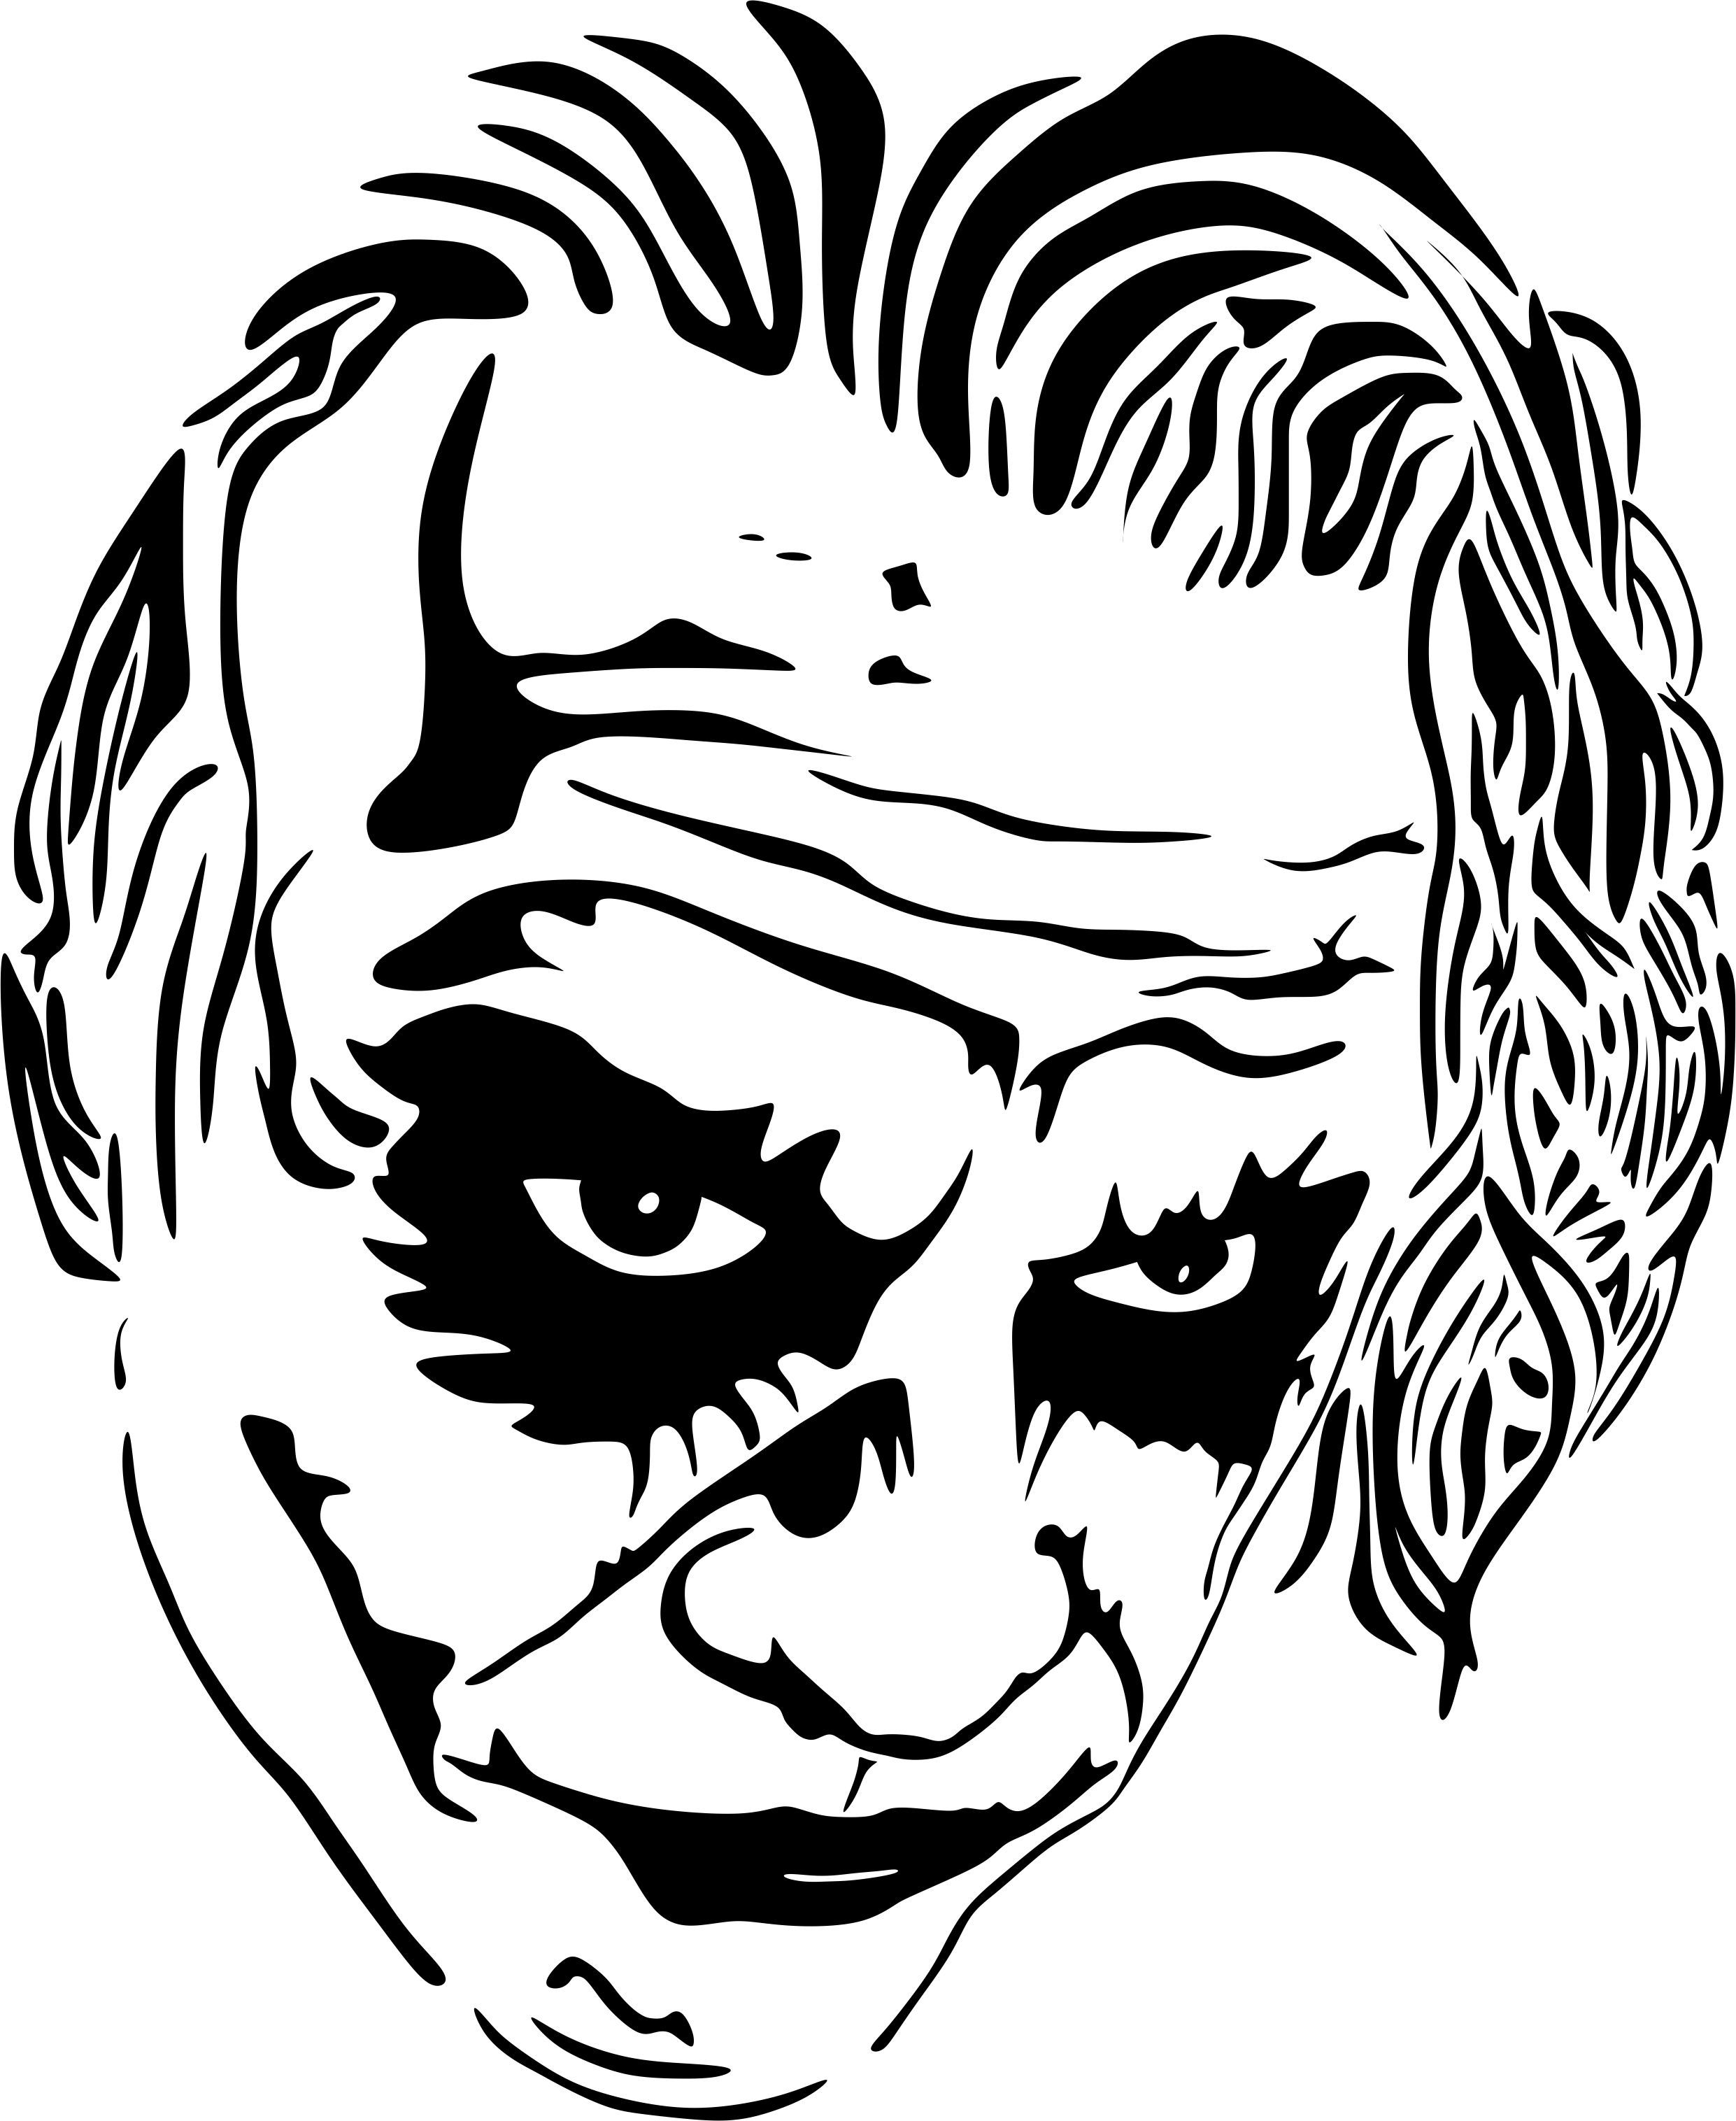 The Joker Line Art : Vector joker vectores pinterest stenciling